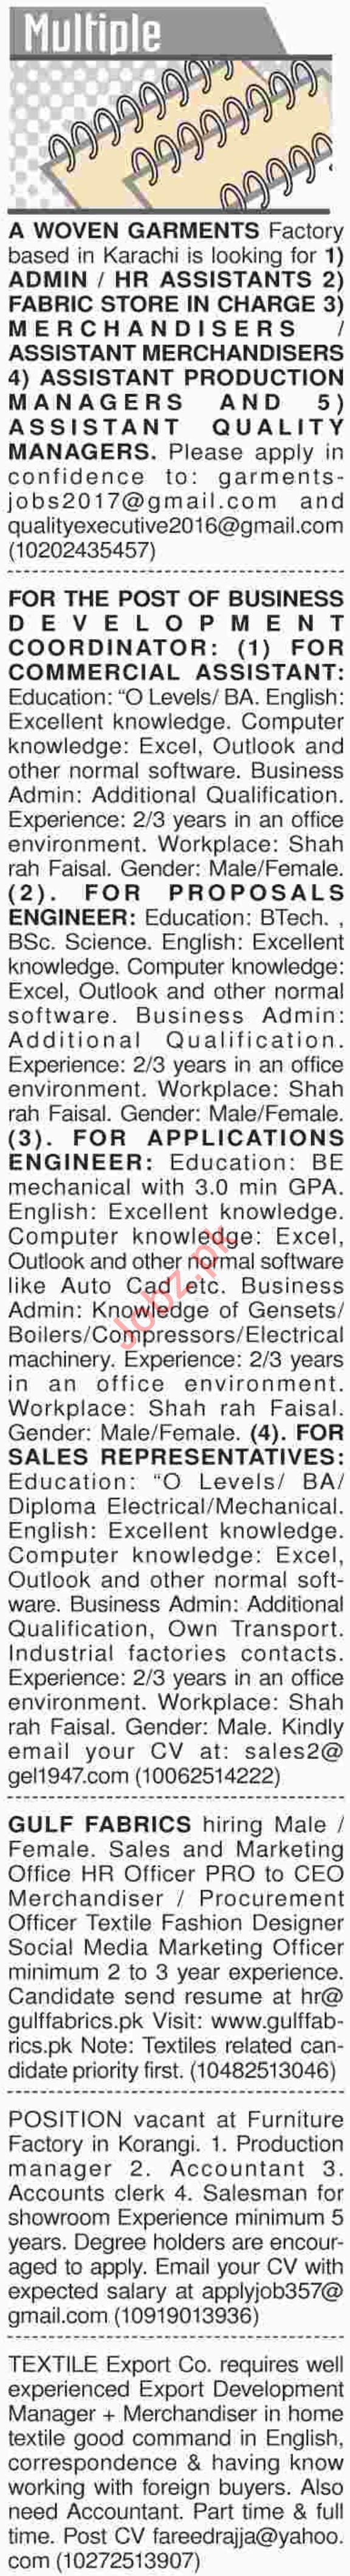 Dawn Newspaper Sunday Multiple Classified Ads 2/12/2018